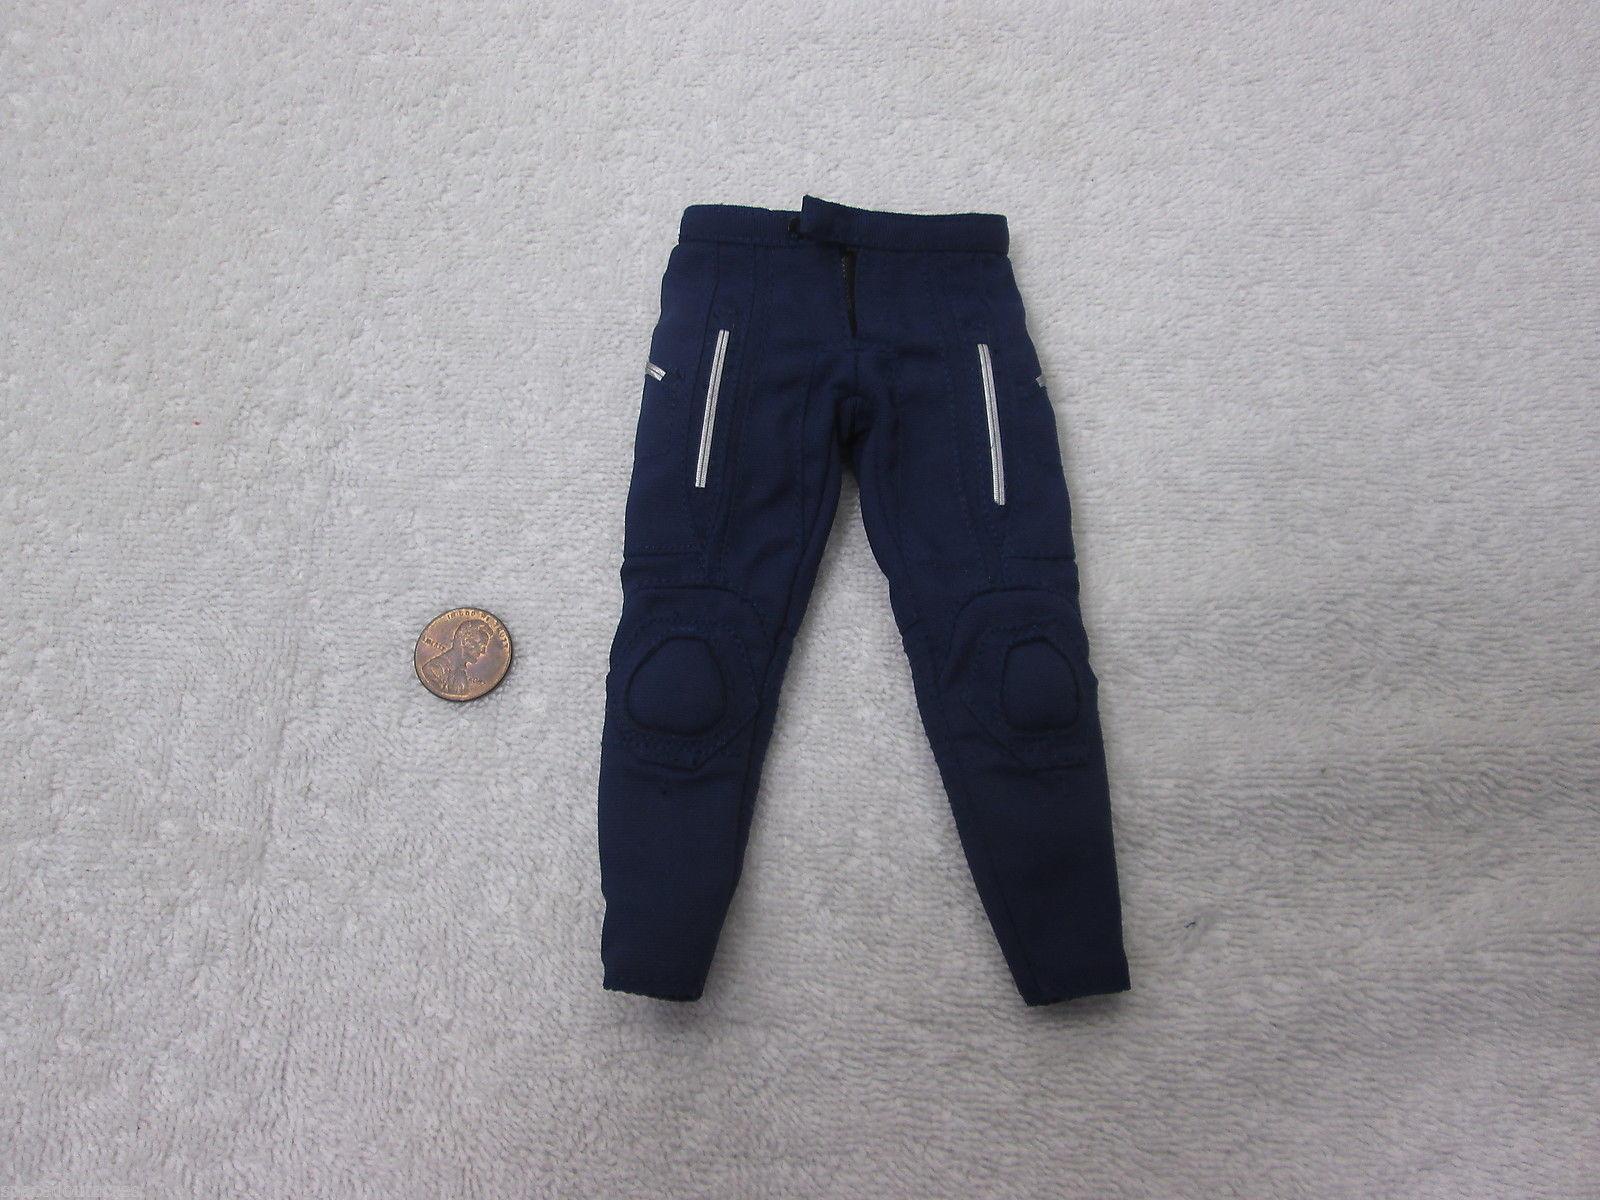 Hot Toys Avengers Captain America Uniform Pants 1/6th Scale MMS 174